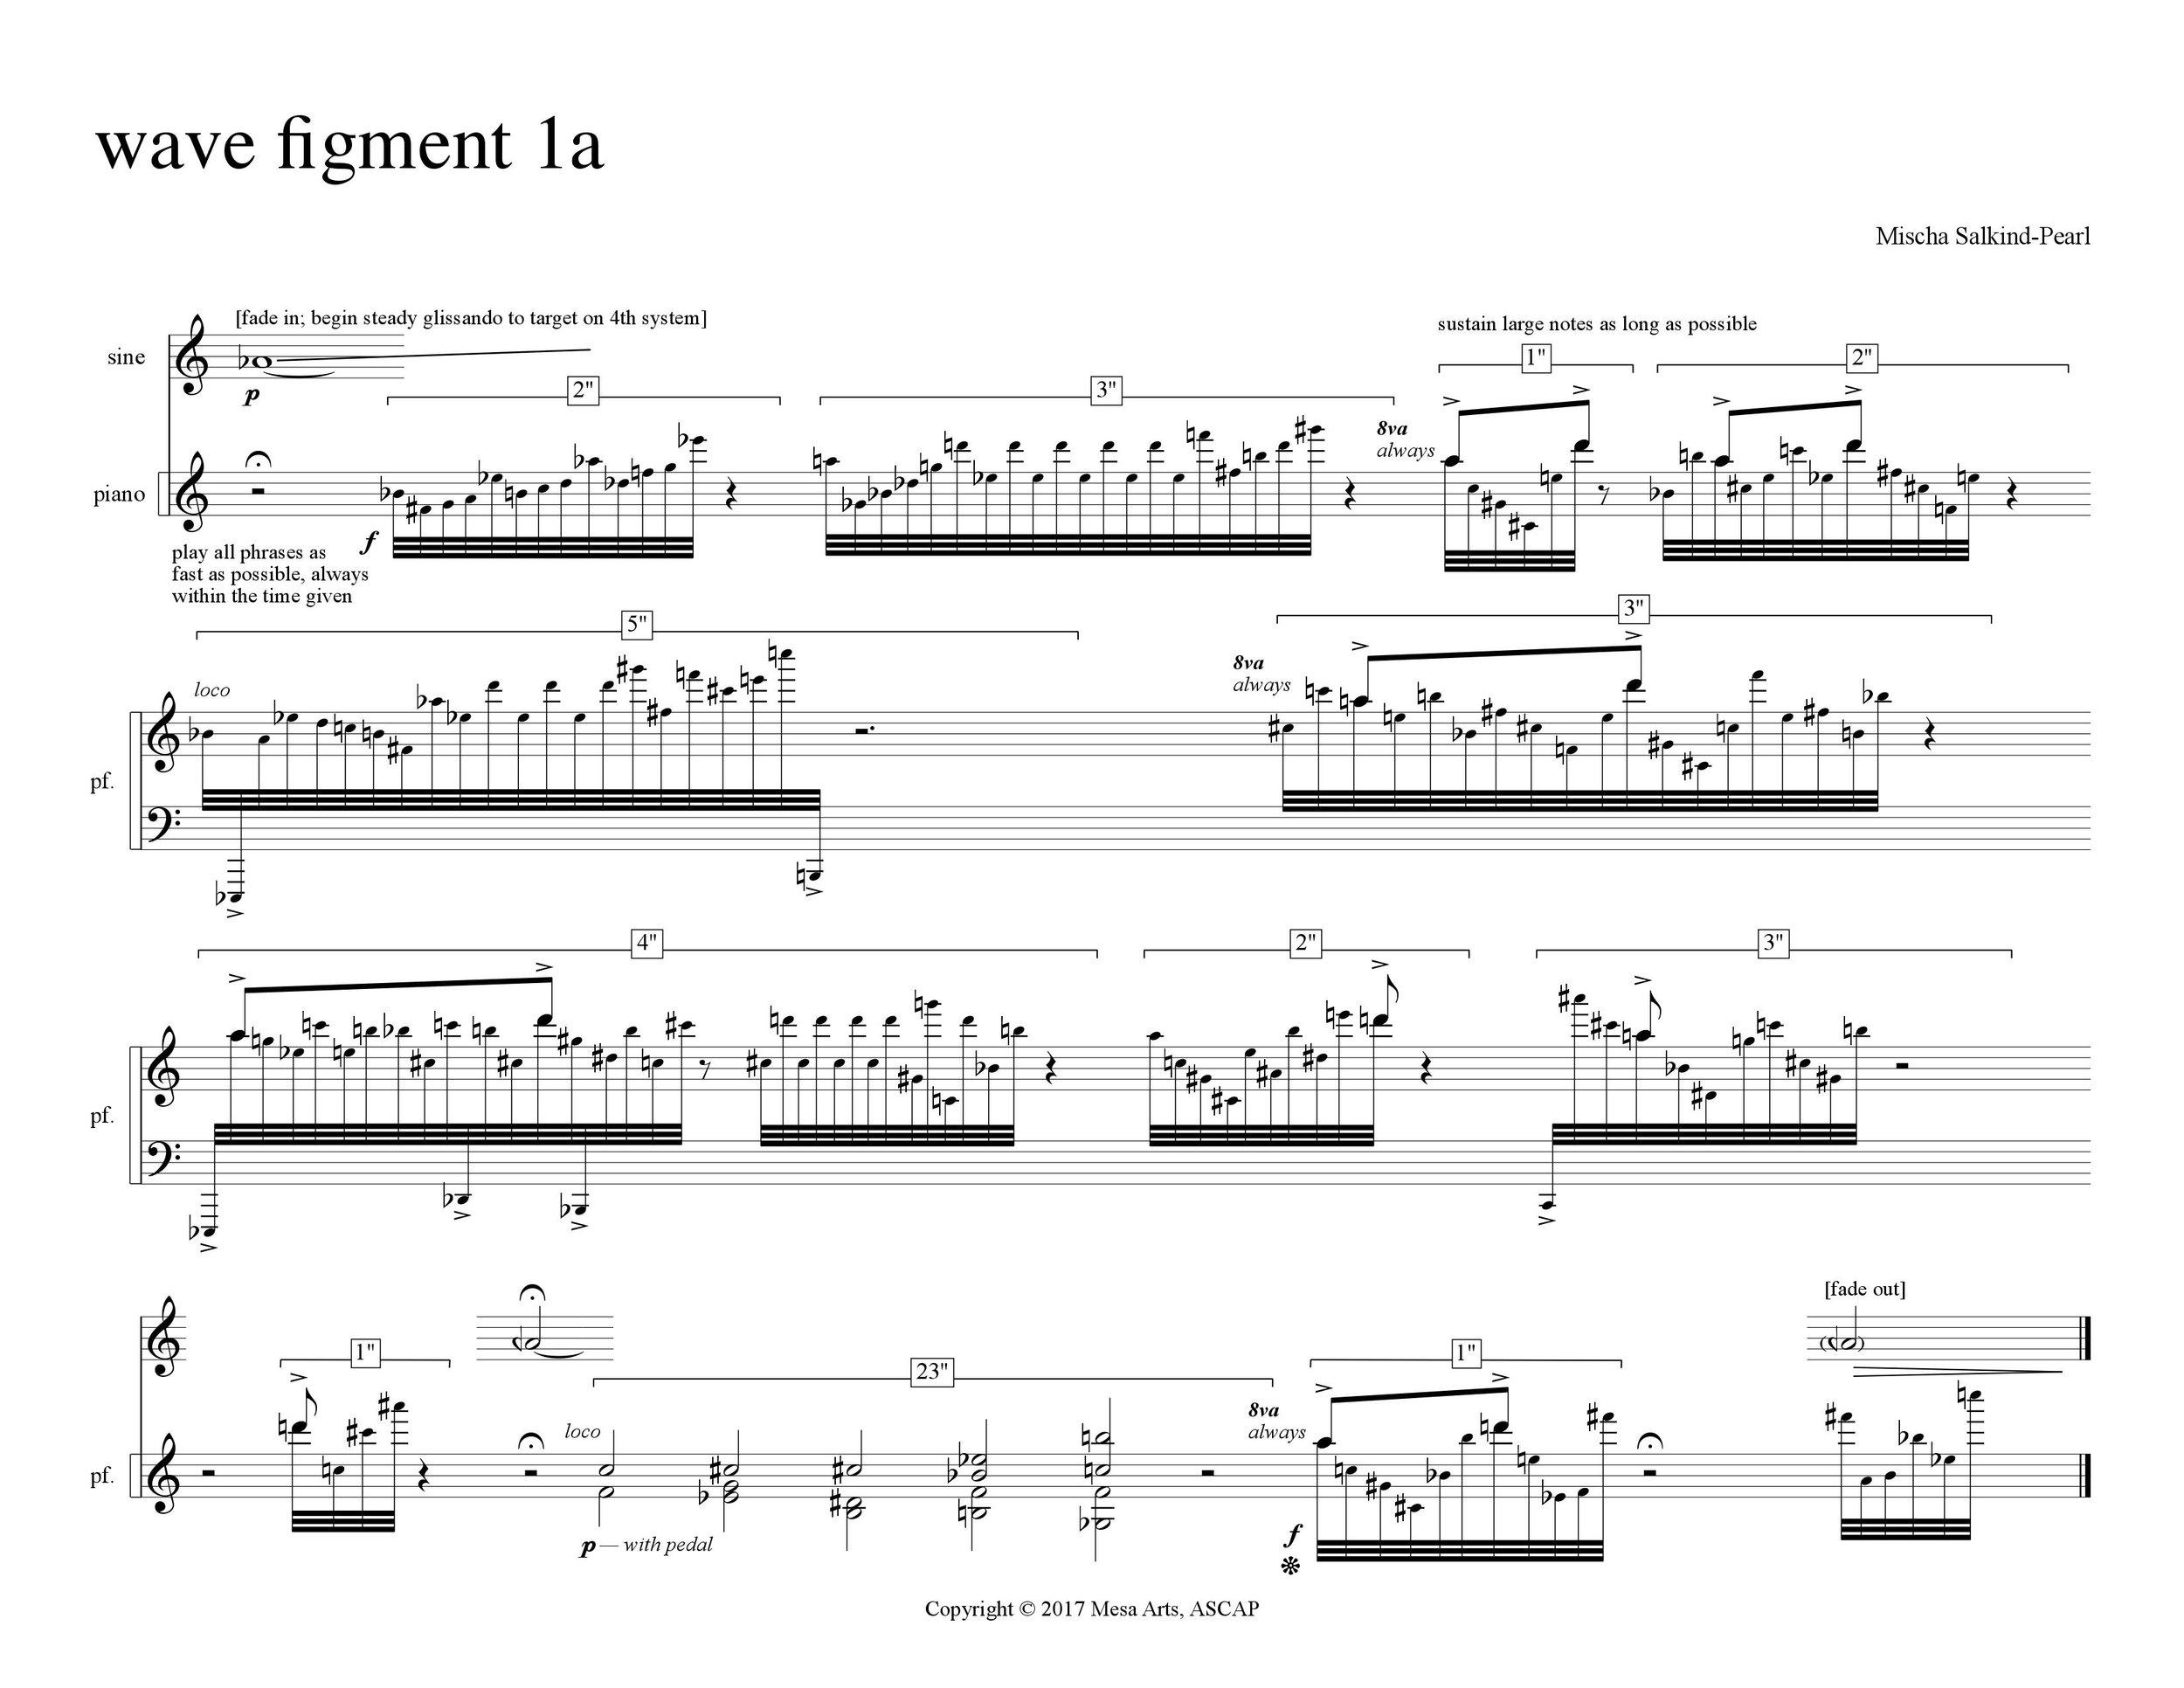 wave figment 1a.jpg